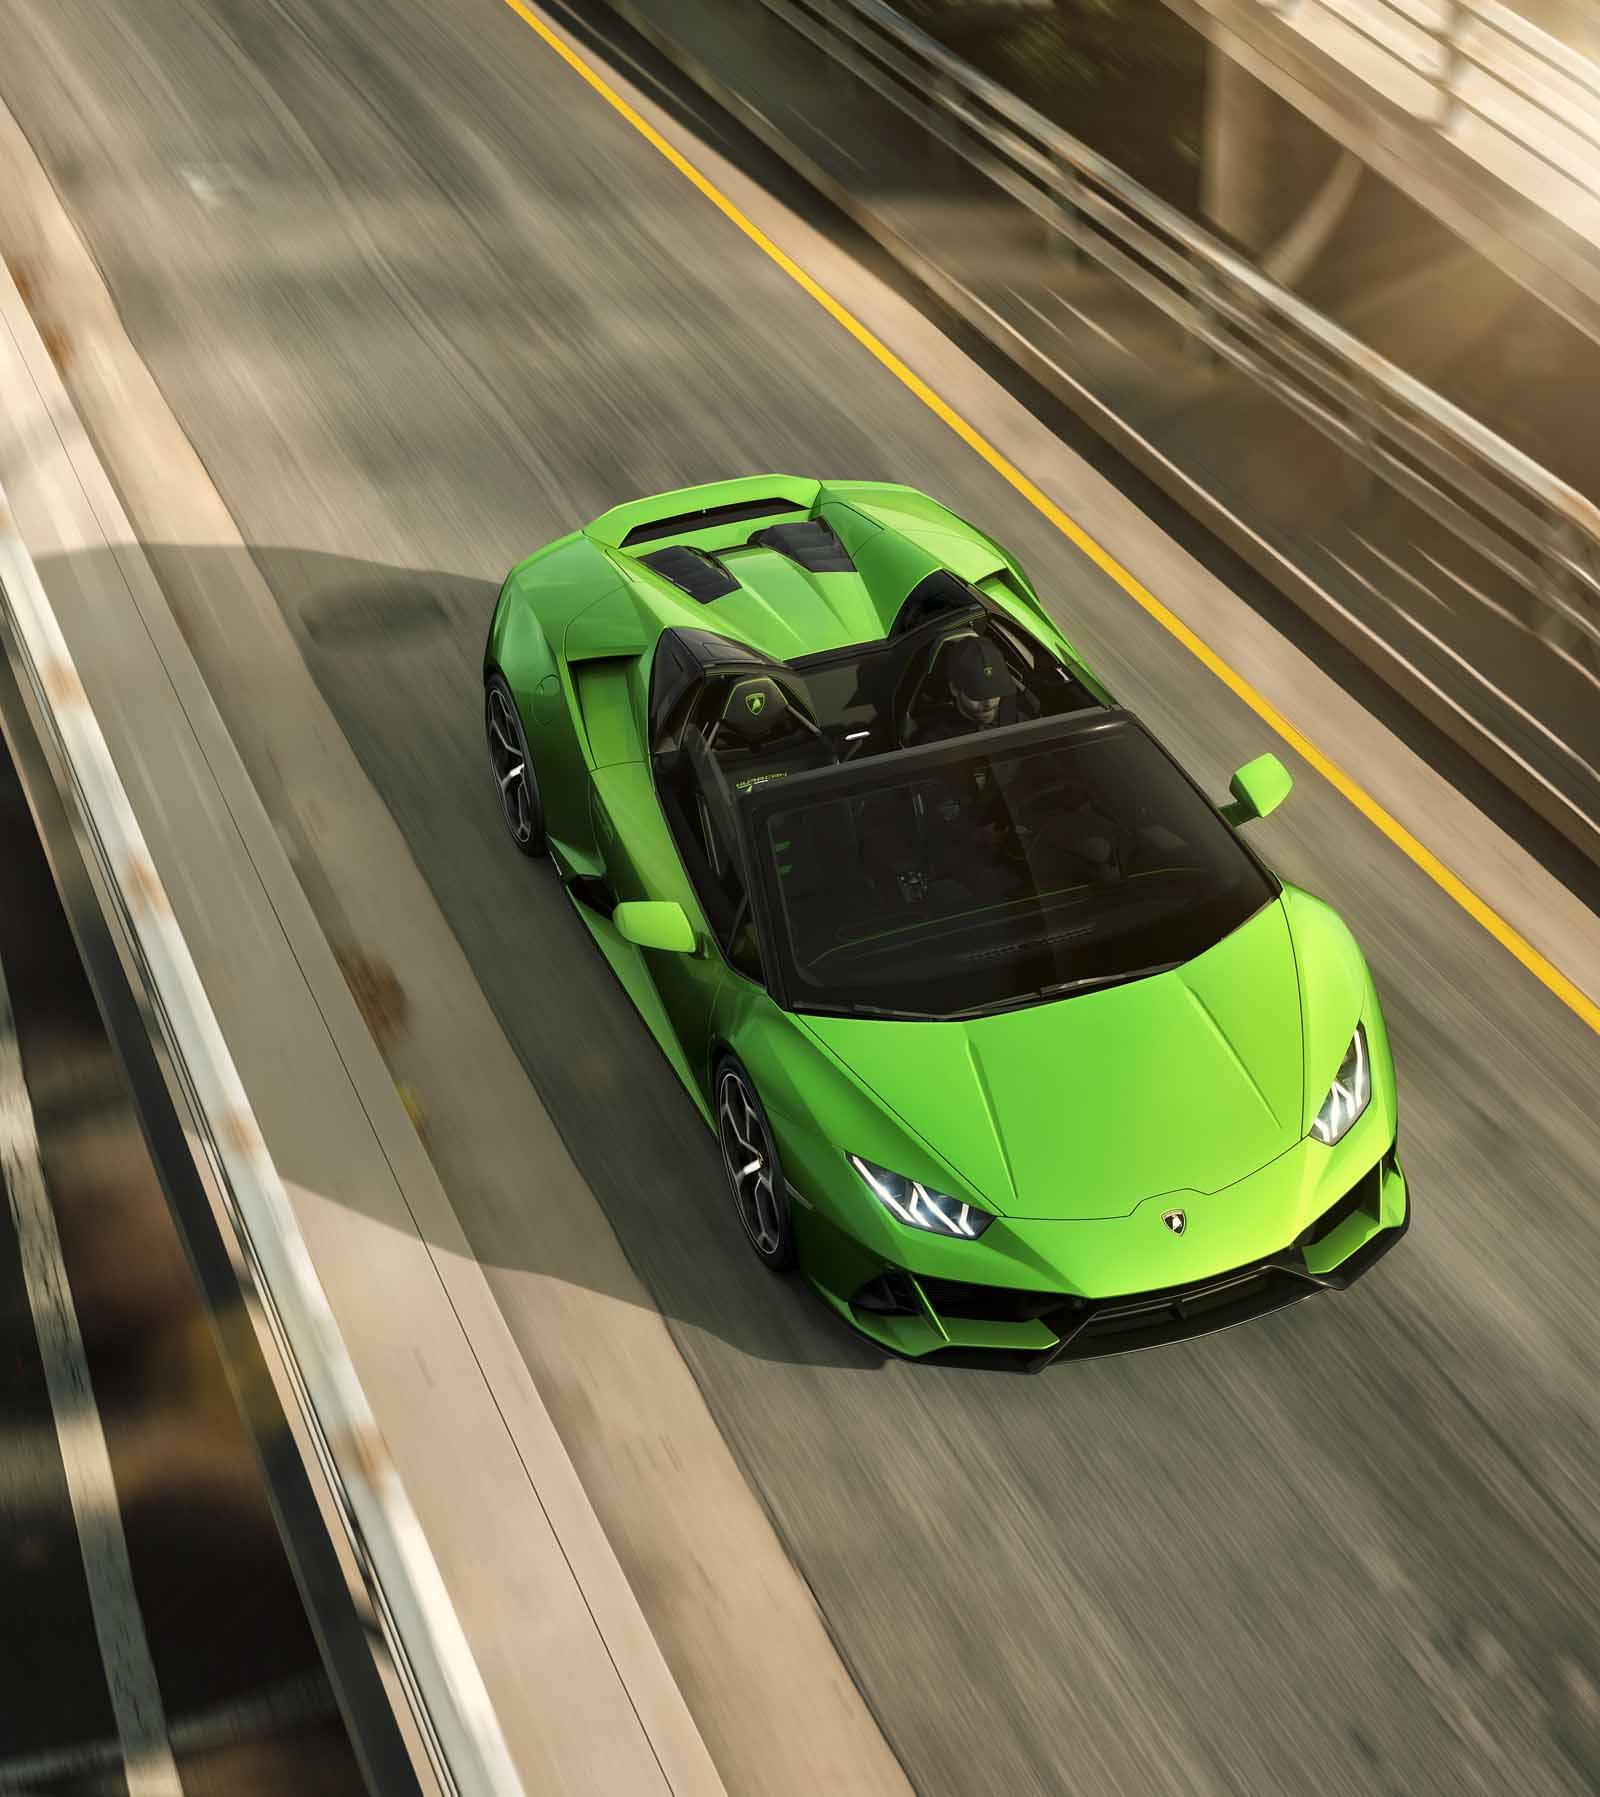 Automobili Lamborghini unveils Huracán EVO Spyder at Geneva Motor